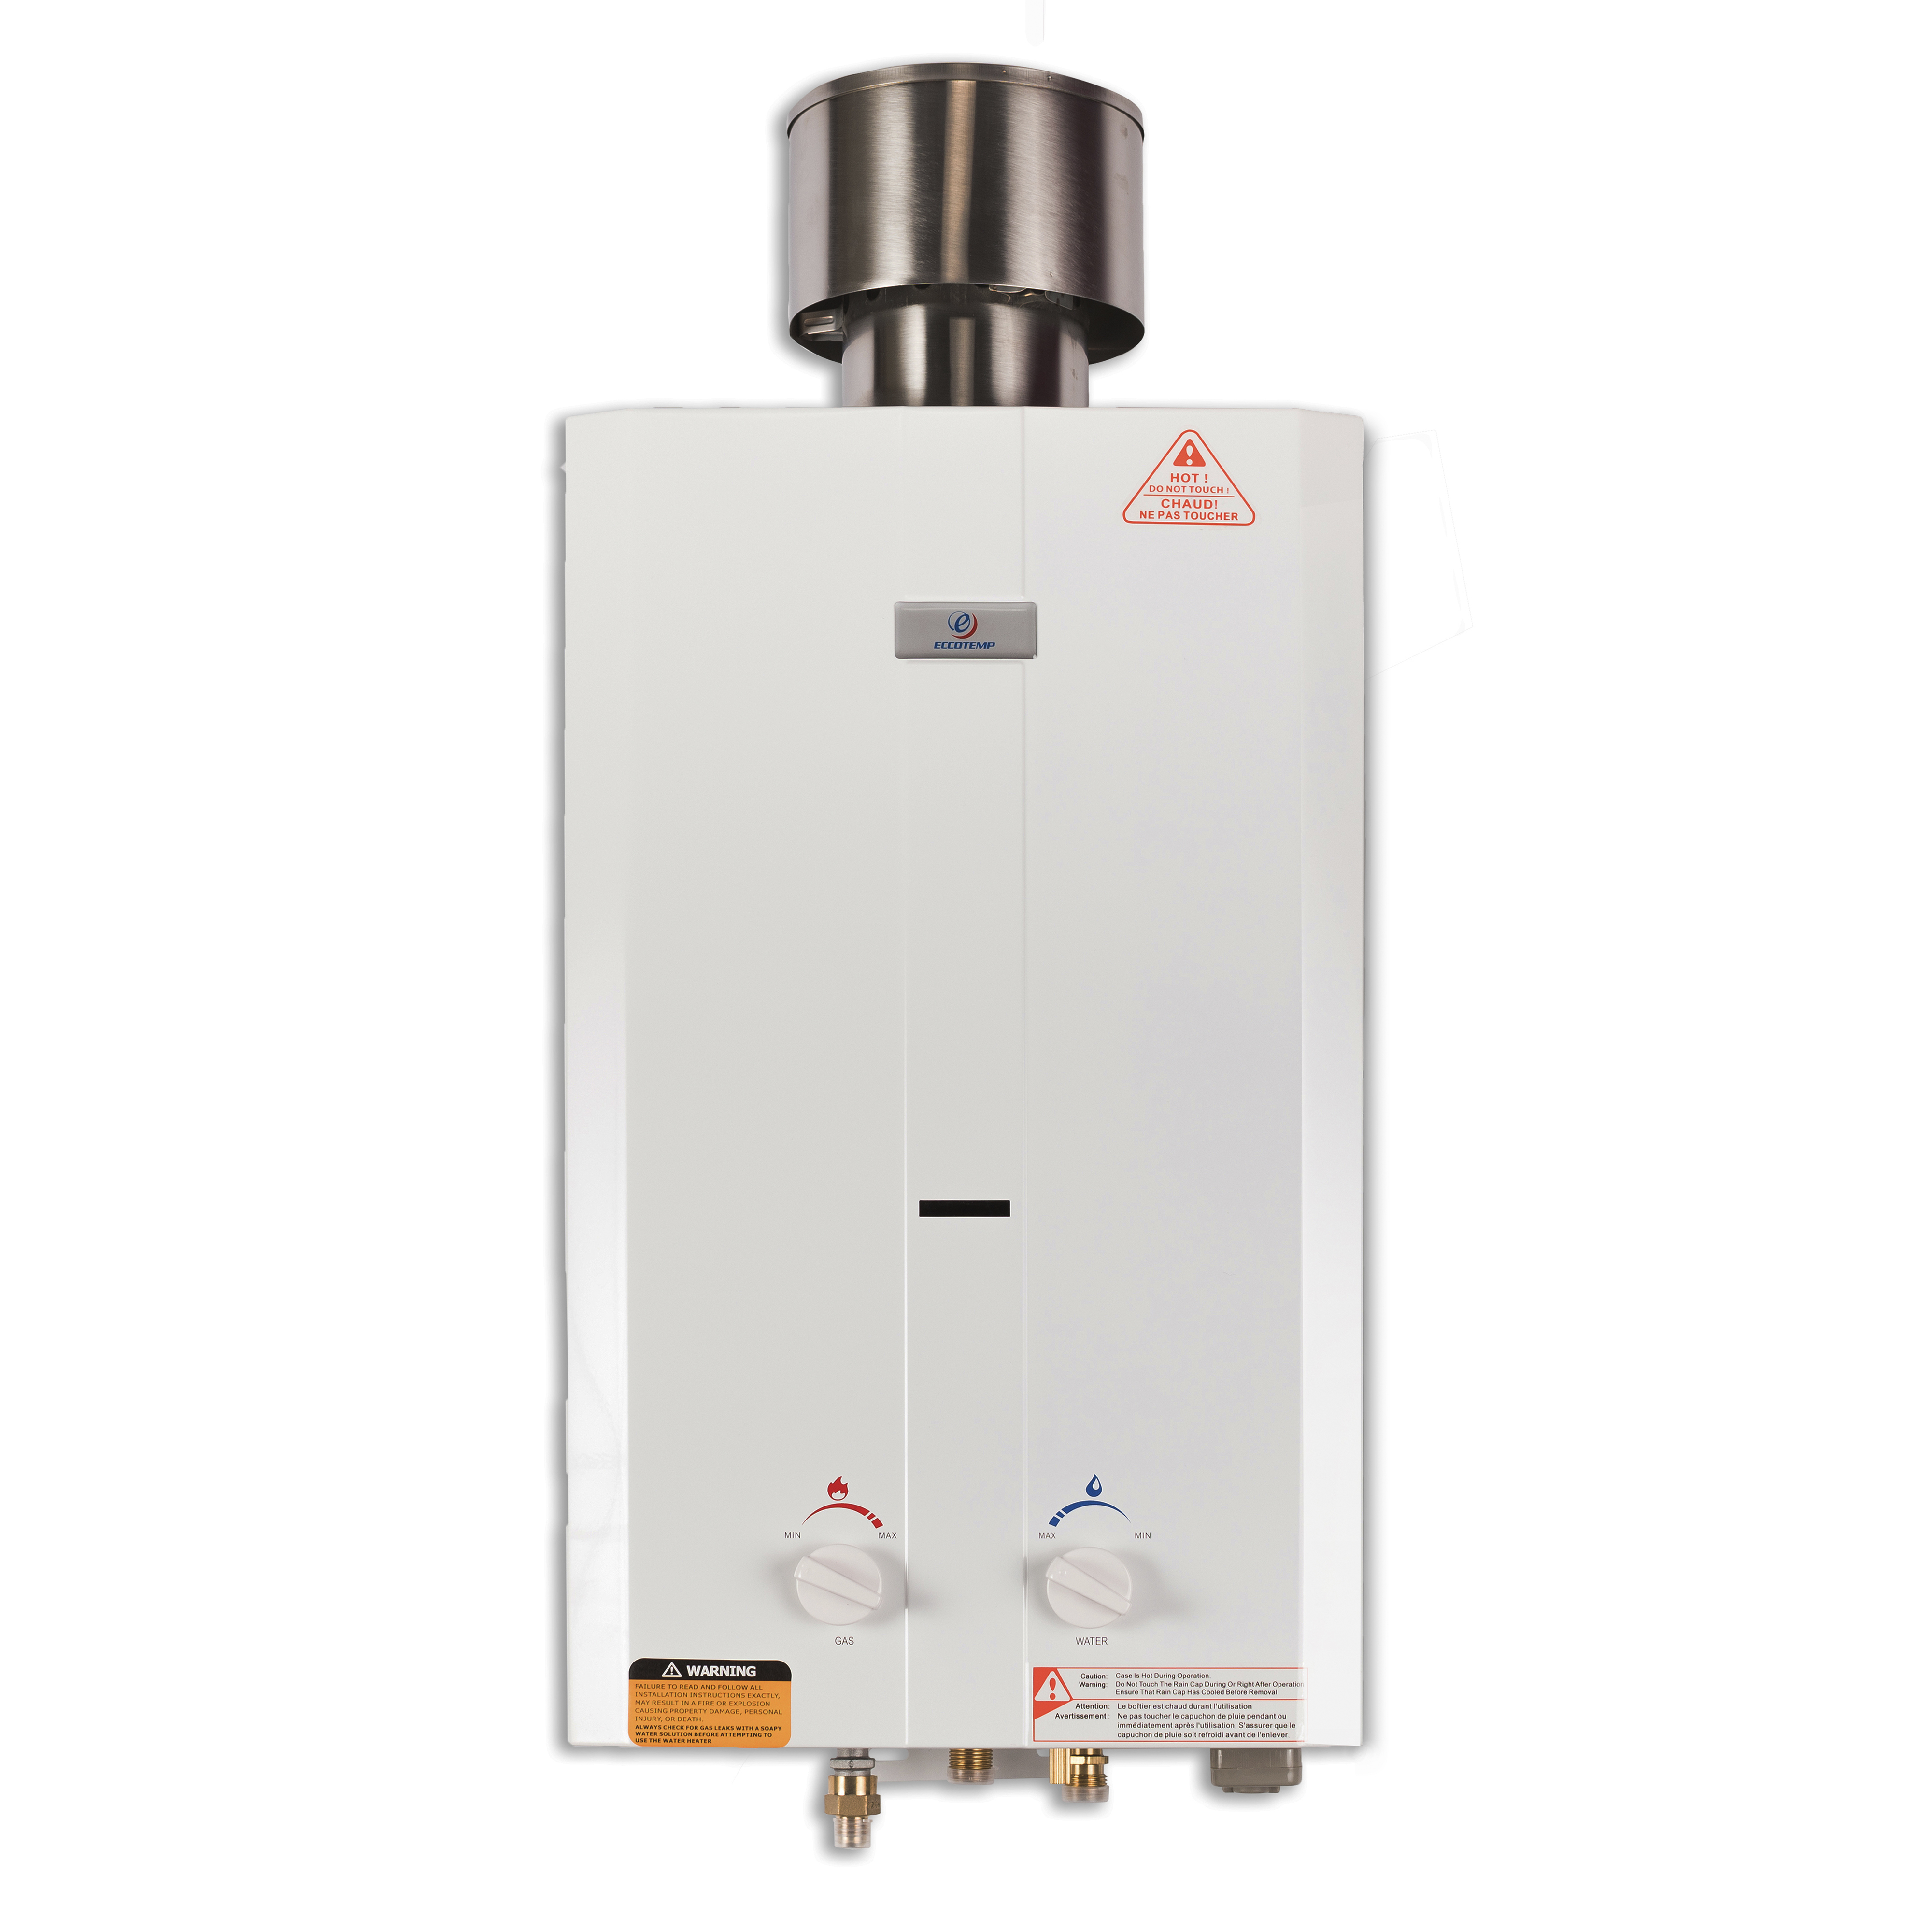 Hot water heater manual ebook manual ebook aliyan us array eccotemp l10 portable outdoor tankless water heater walmart com rh walmart fandeluxe Gallery